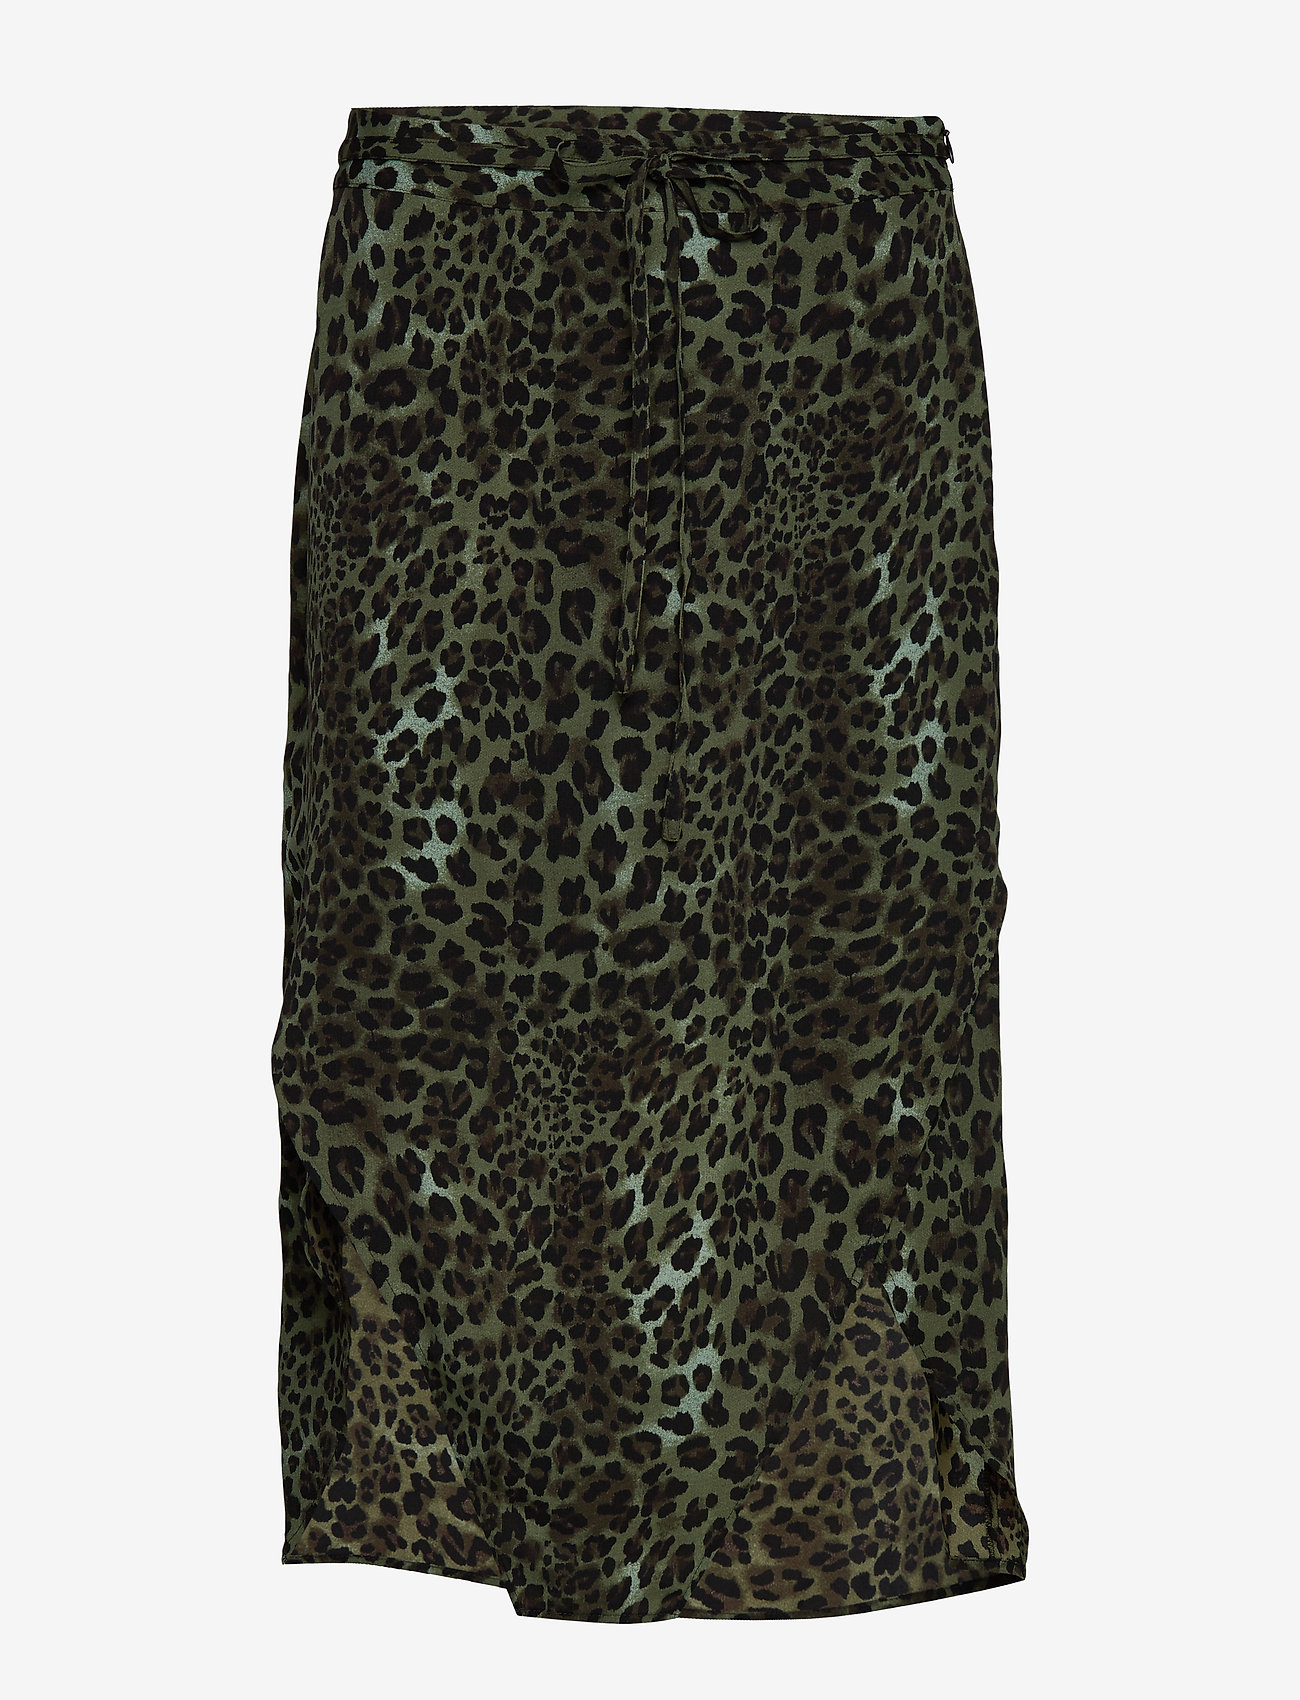 Sofie Schnoor - Skirt - midinederdele - faded green - 0